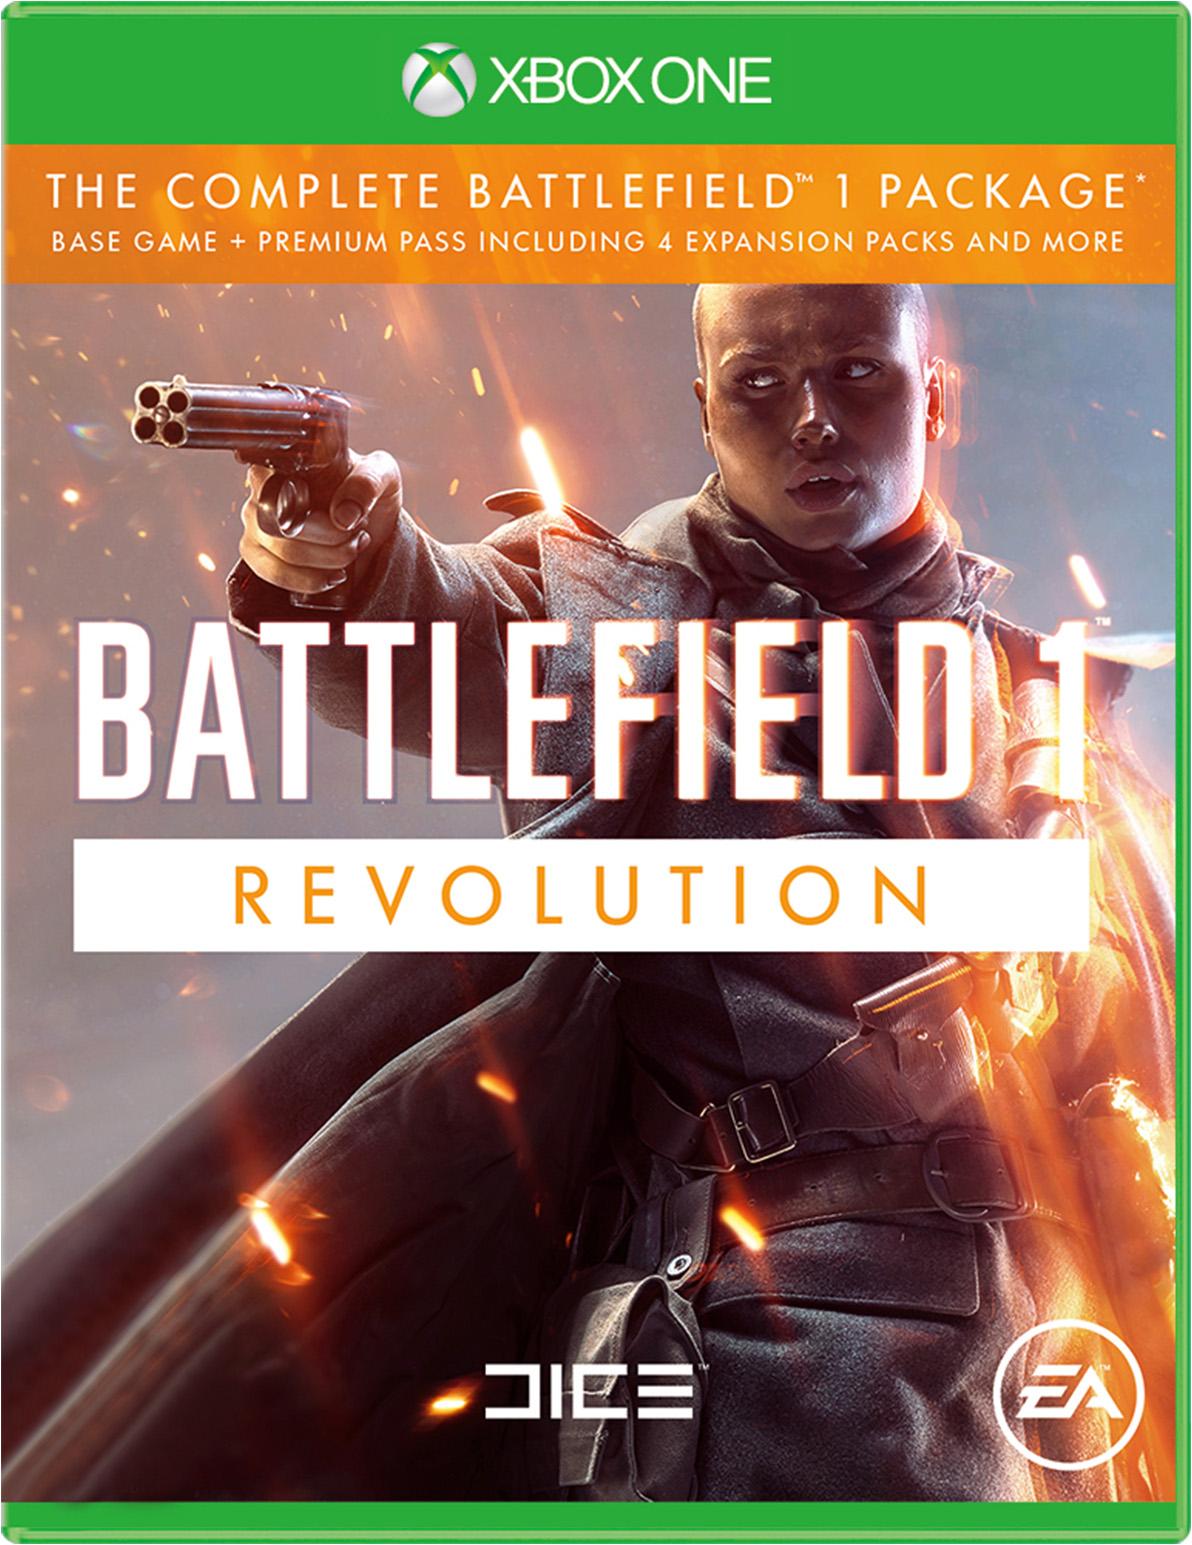 Battlefield 1 Revolution for Xbox One